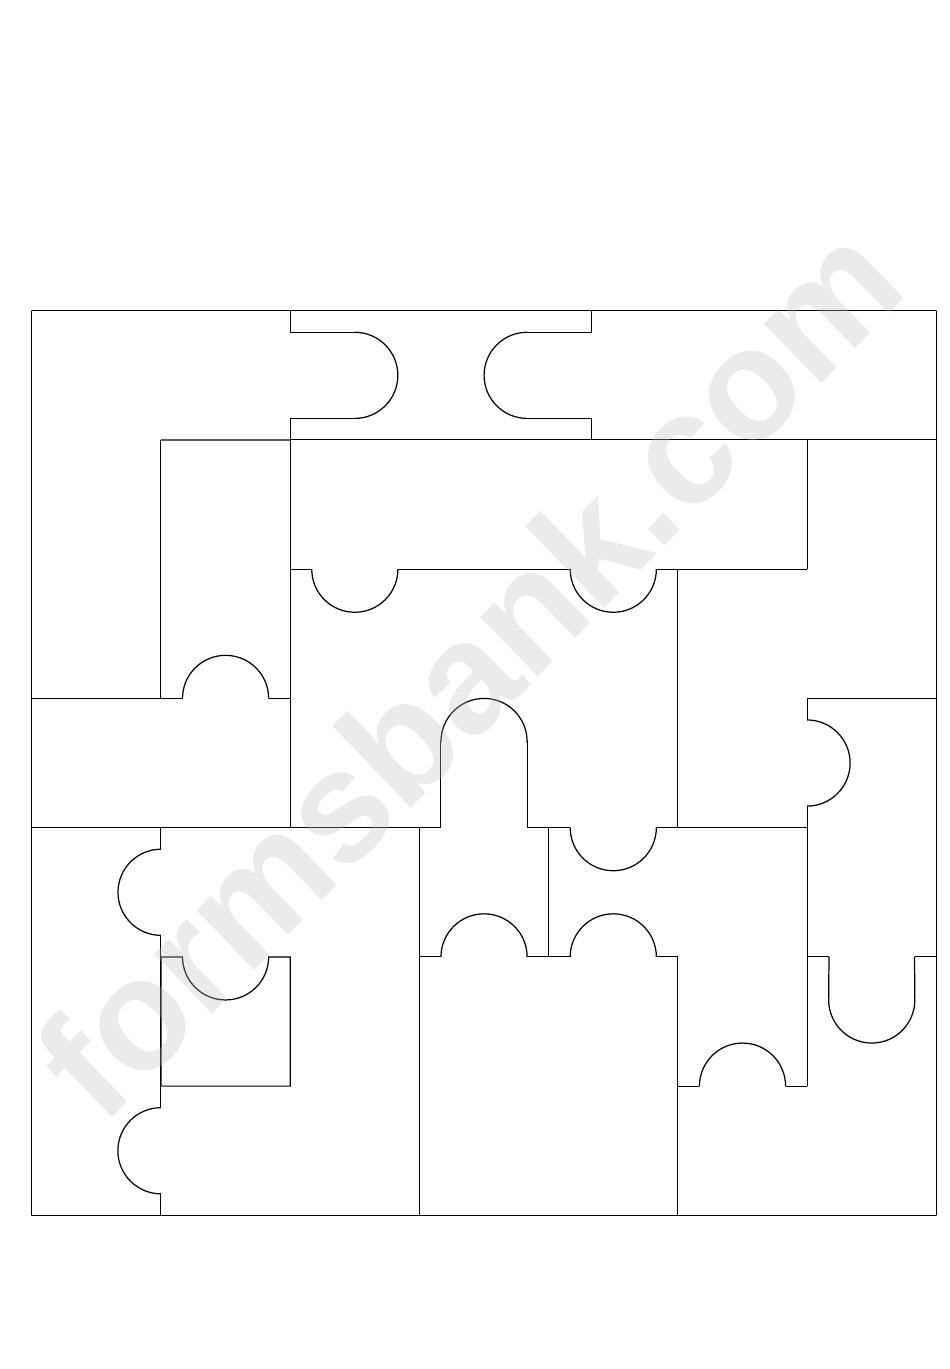 16 Pieces Puzzle Template printable pdf download